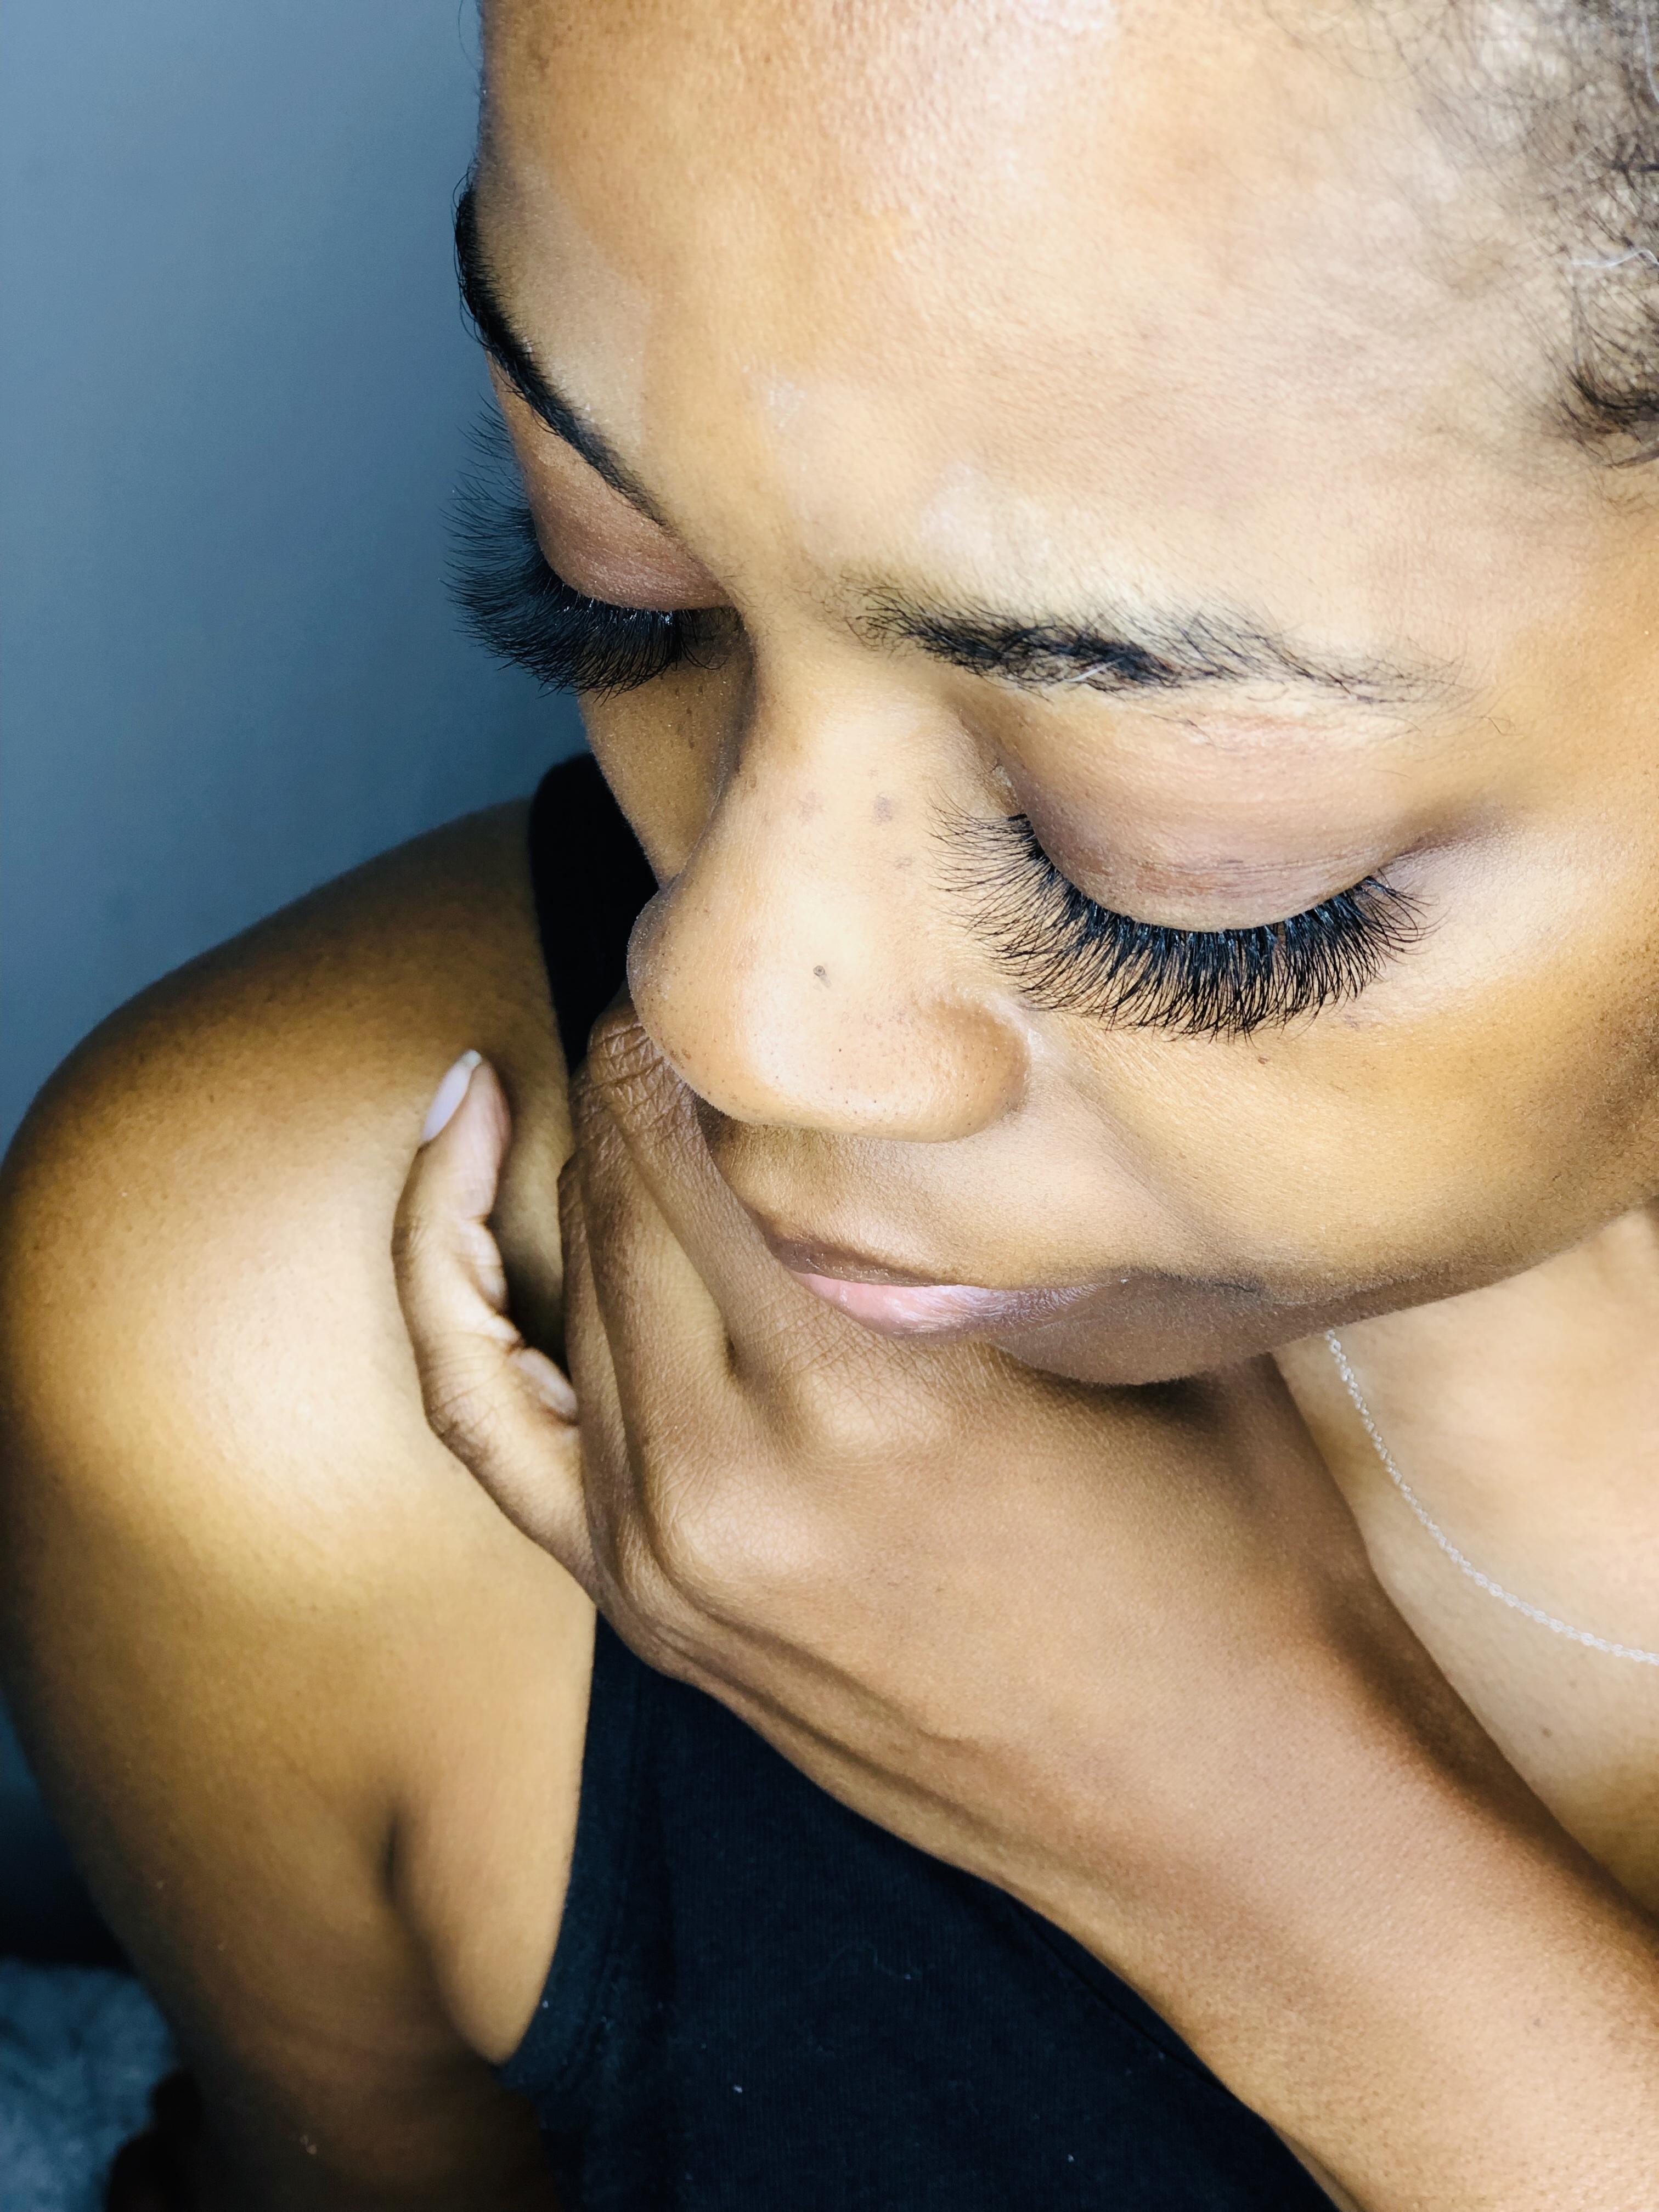 Volume Eyelashes With Atlanta Favorite Makeup Artist Day